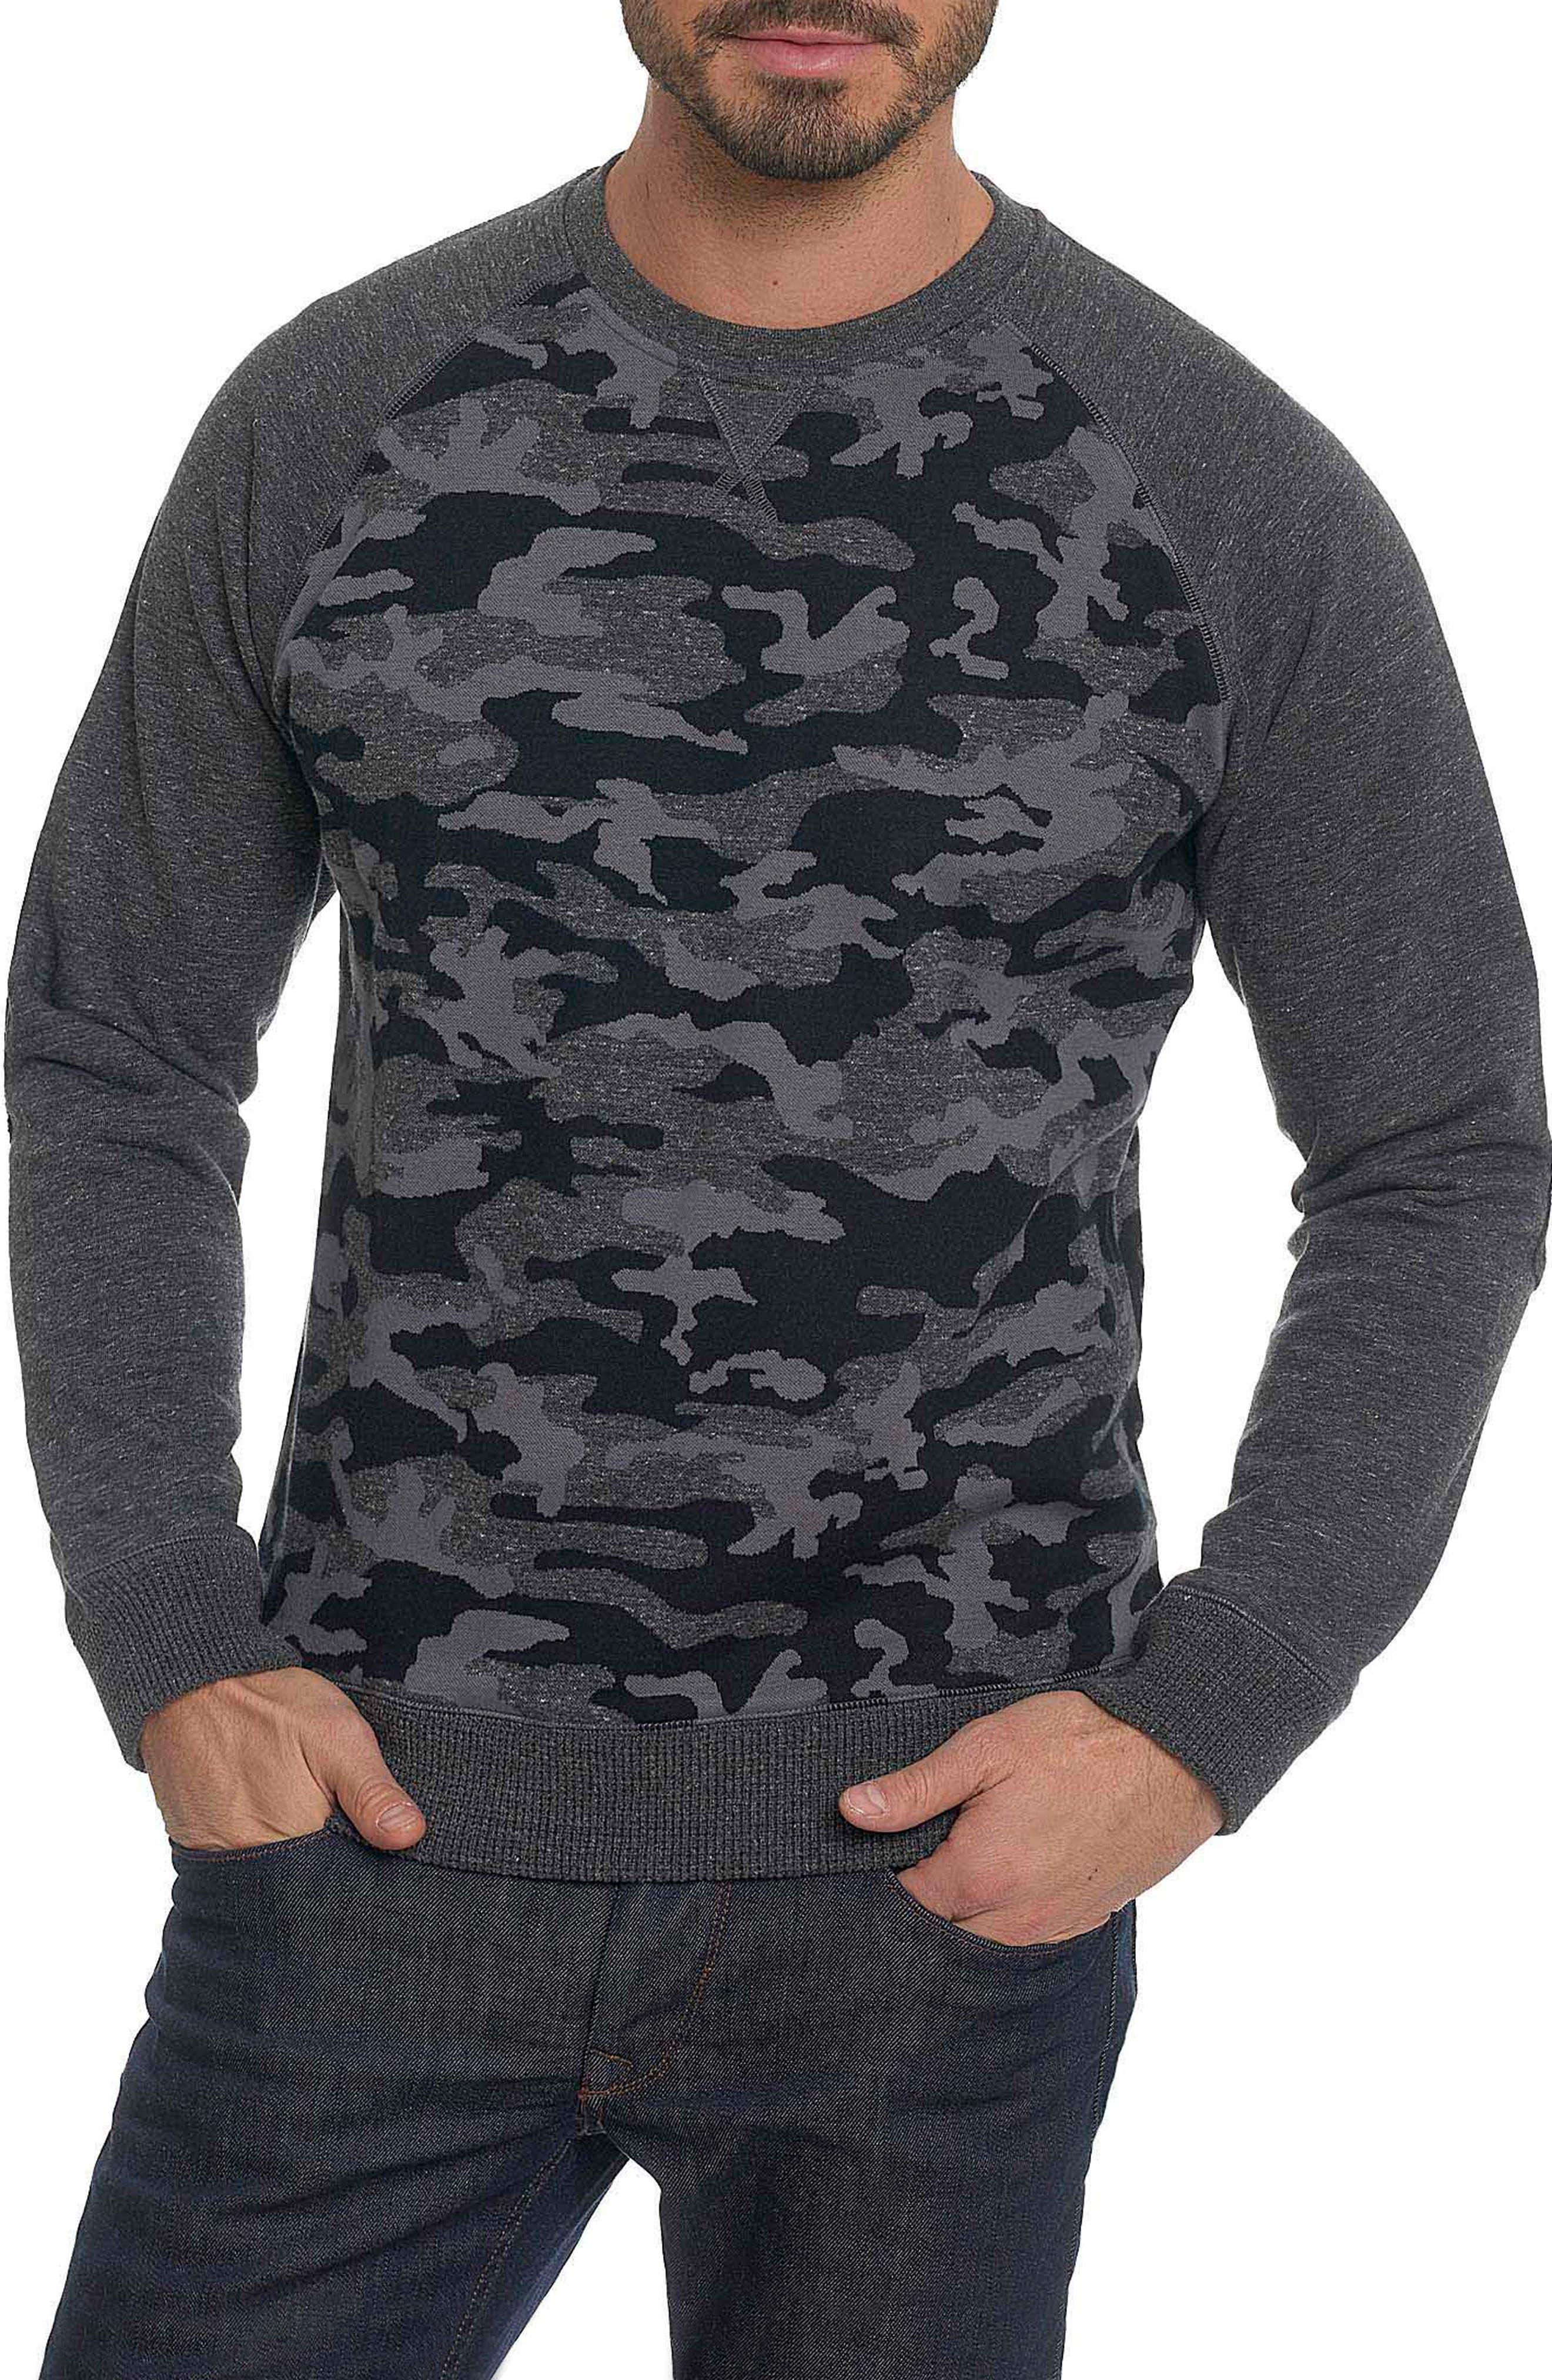 Alternate Image 1 Selected - Robert Graham Mooers Camo Raglan Sleeve Shirt